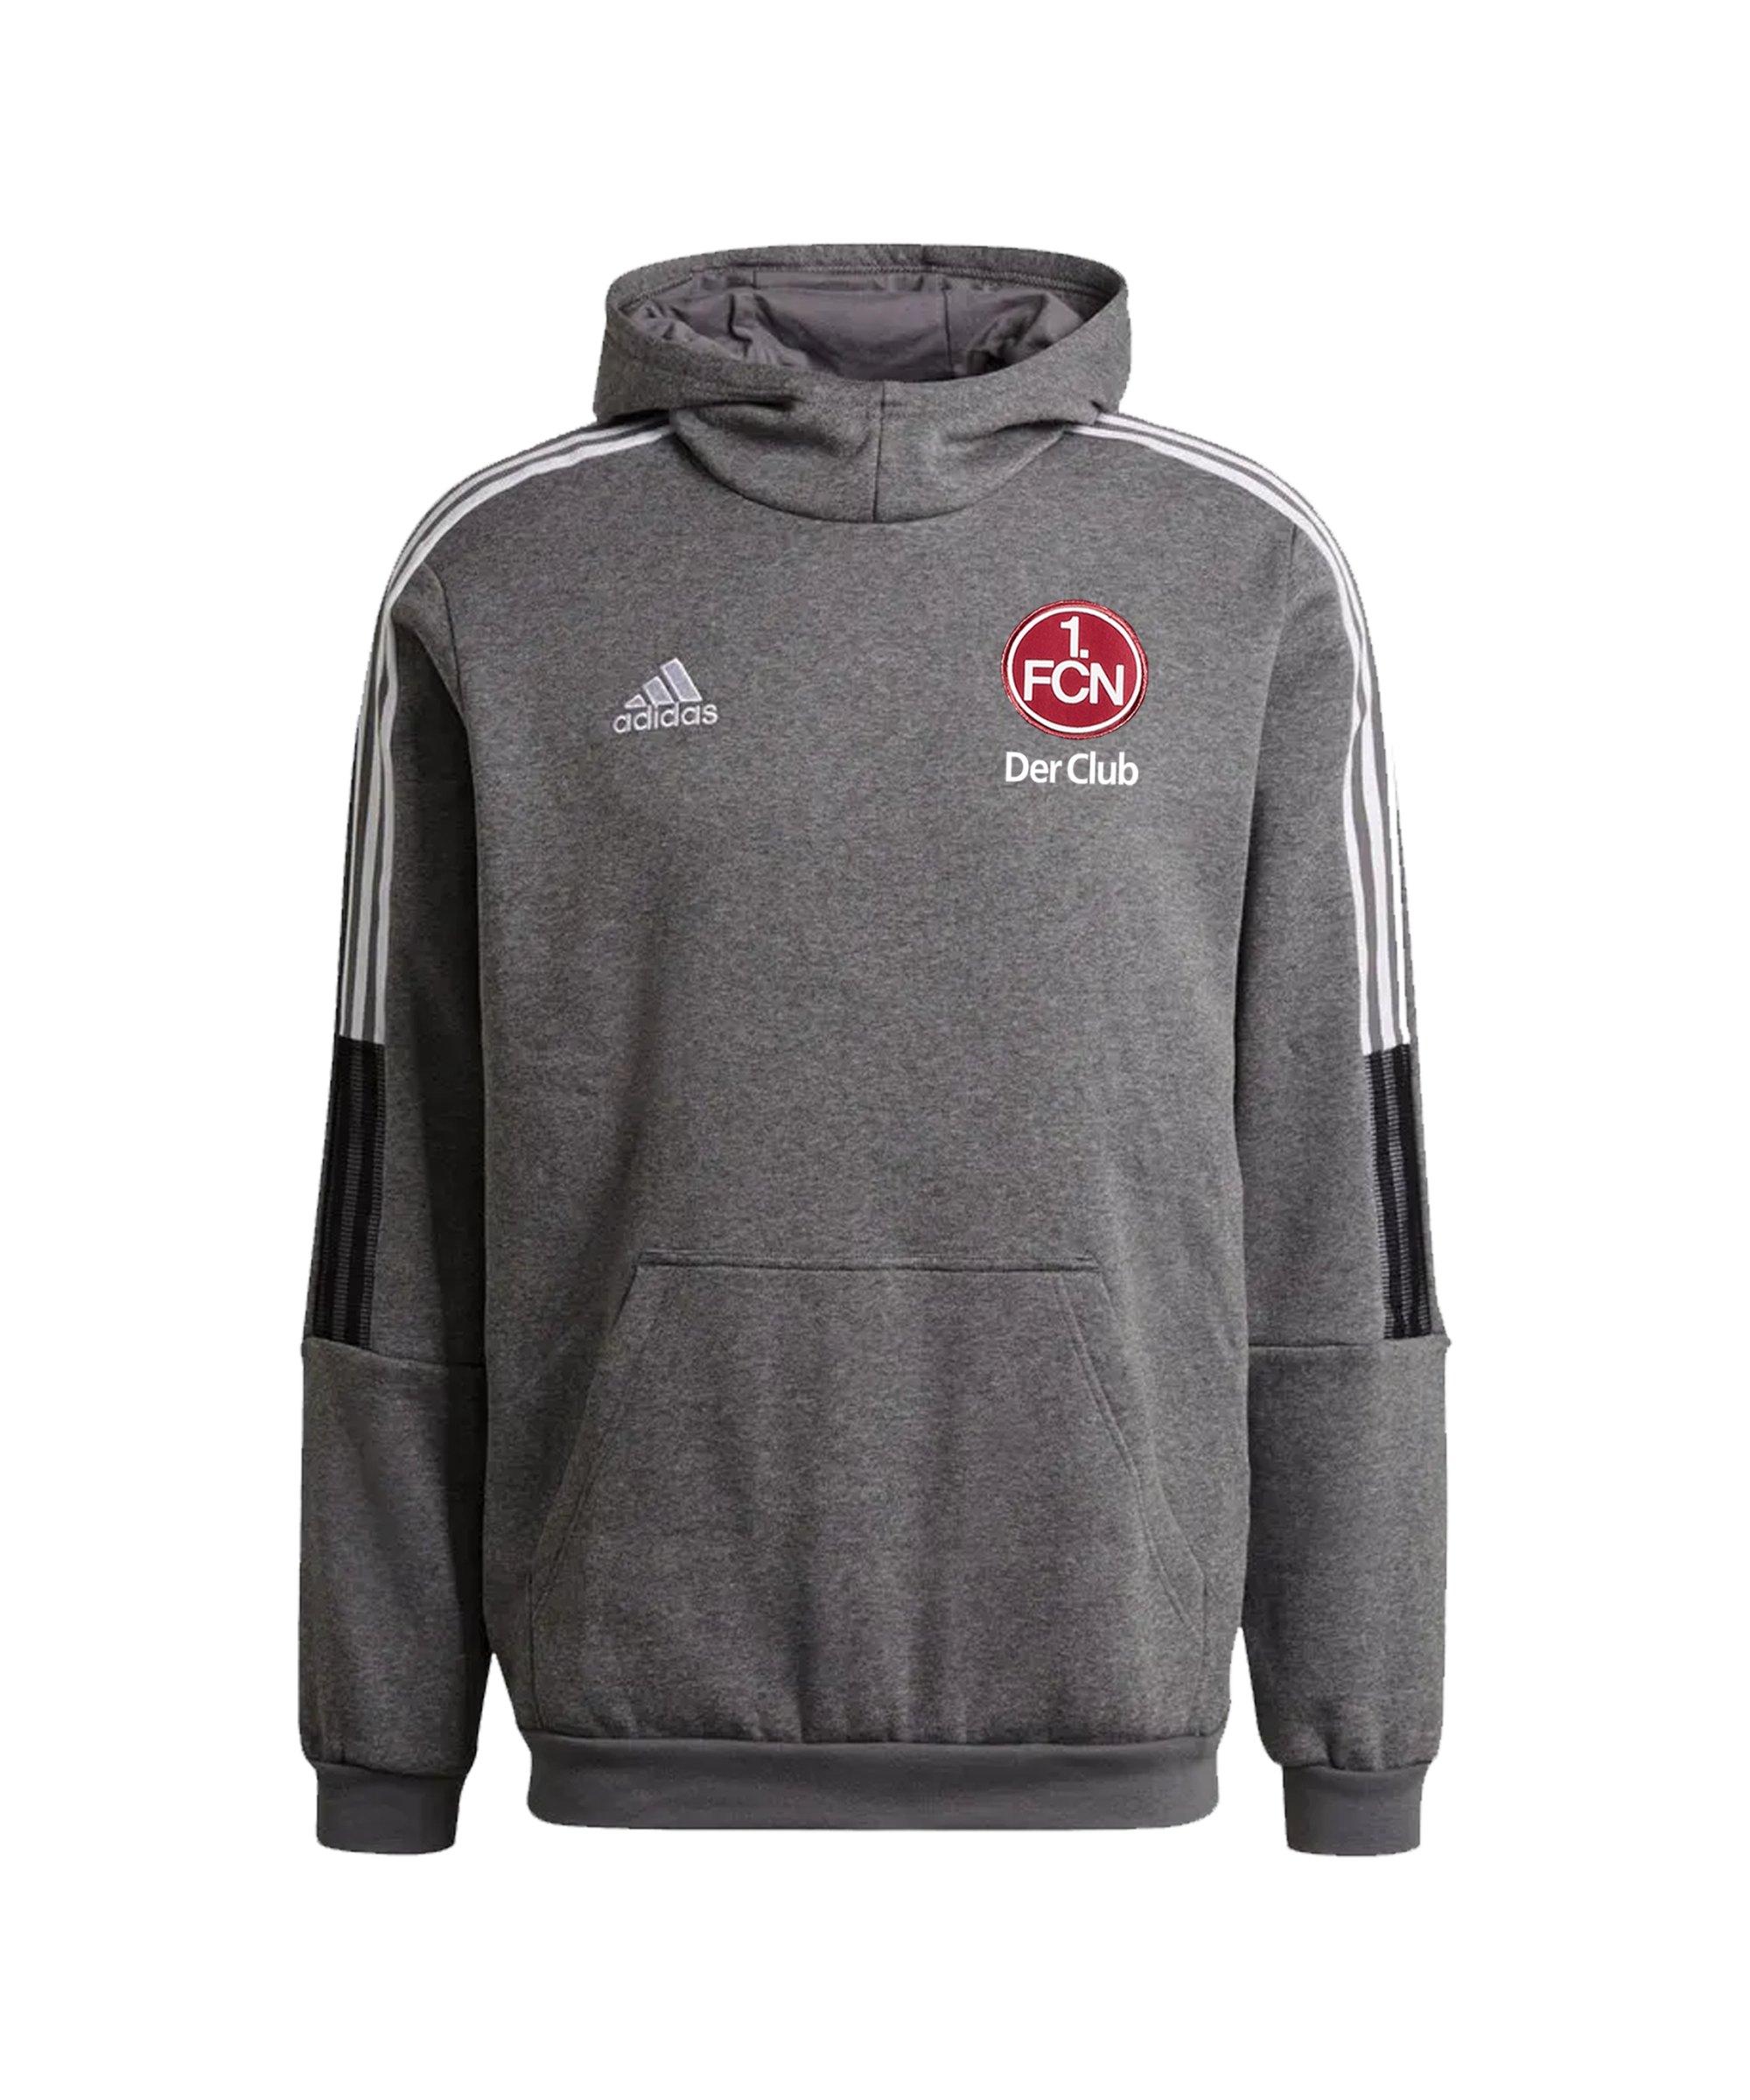 adidas 1. FC Nürnberg Hoody Grau - grau